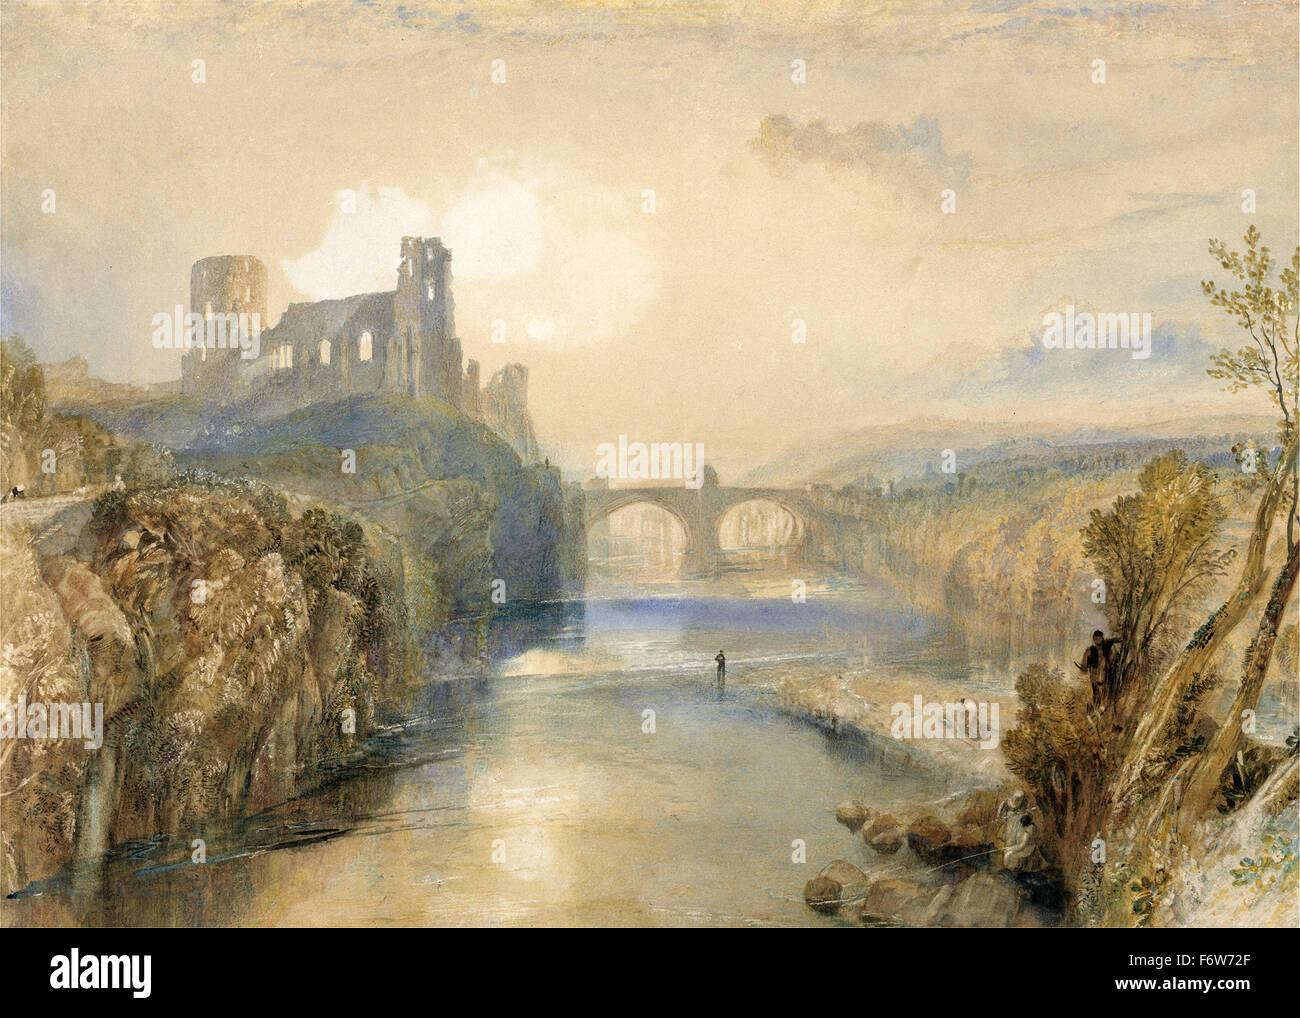 Joseph Mallord William Turner - Barnard Castle - Stock Image